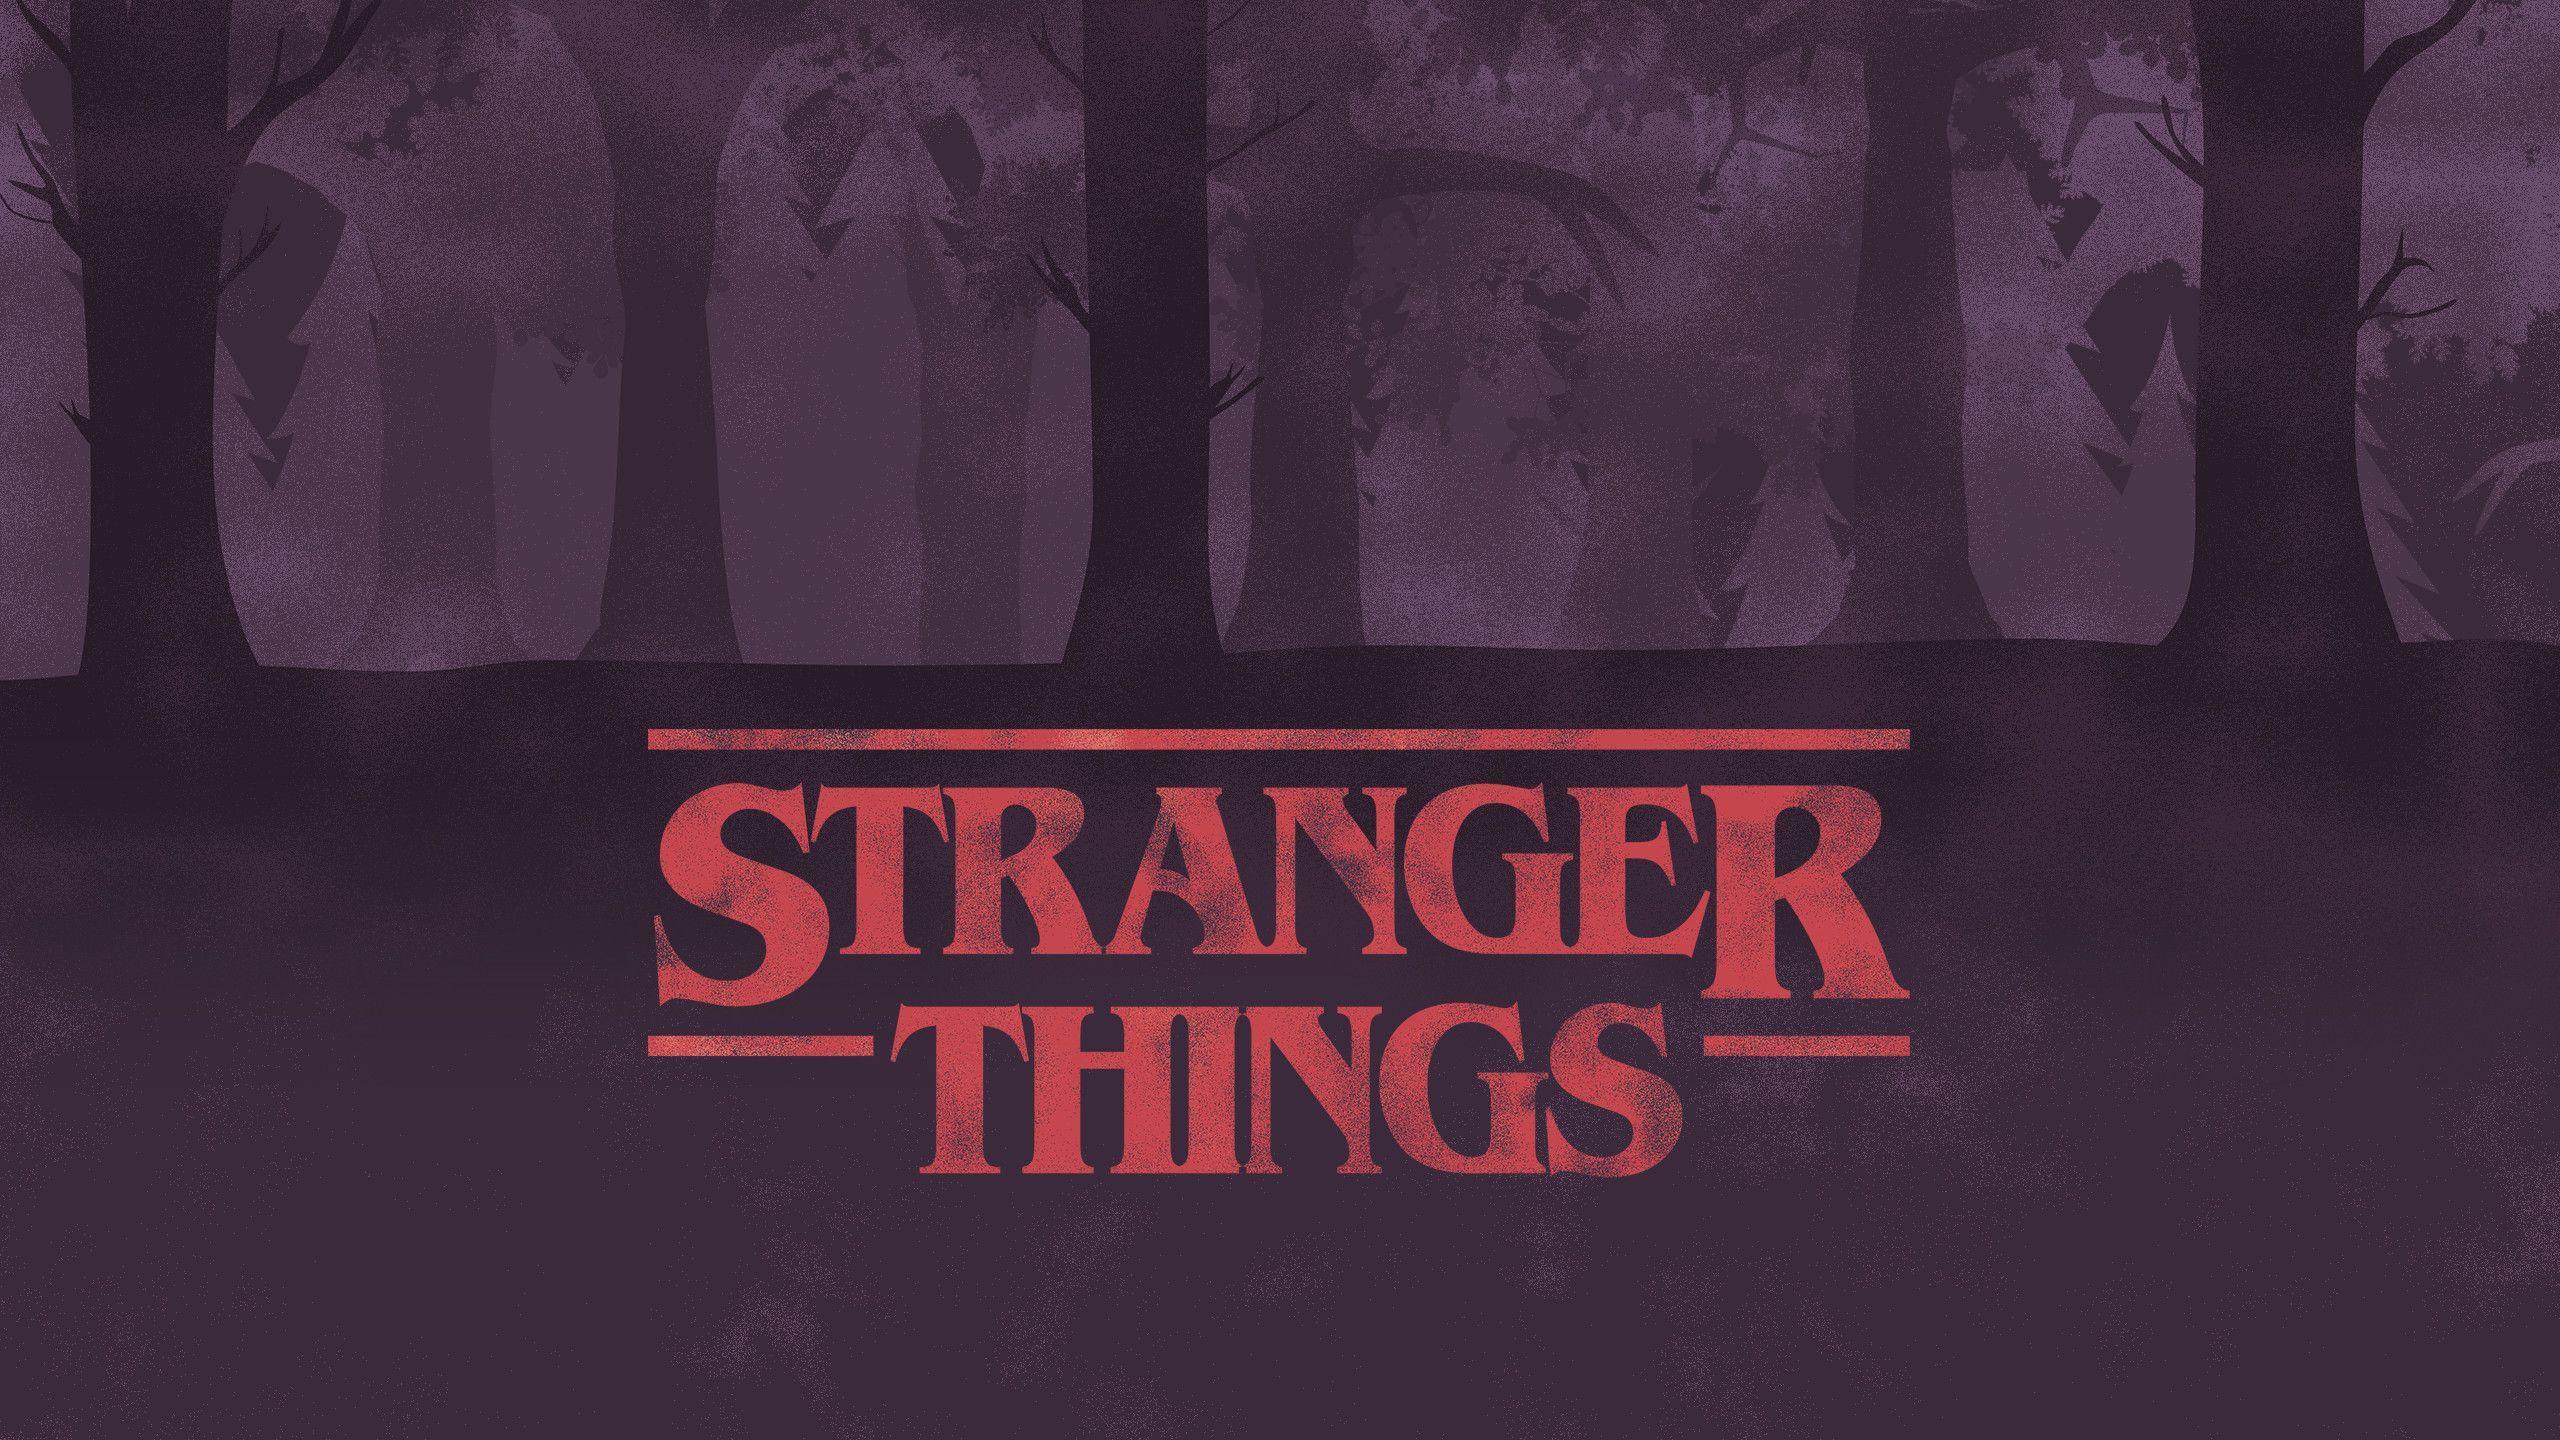 Stranger Things Aesthetic Laptop Wallpapers Top Free Stranger